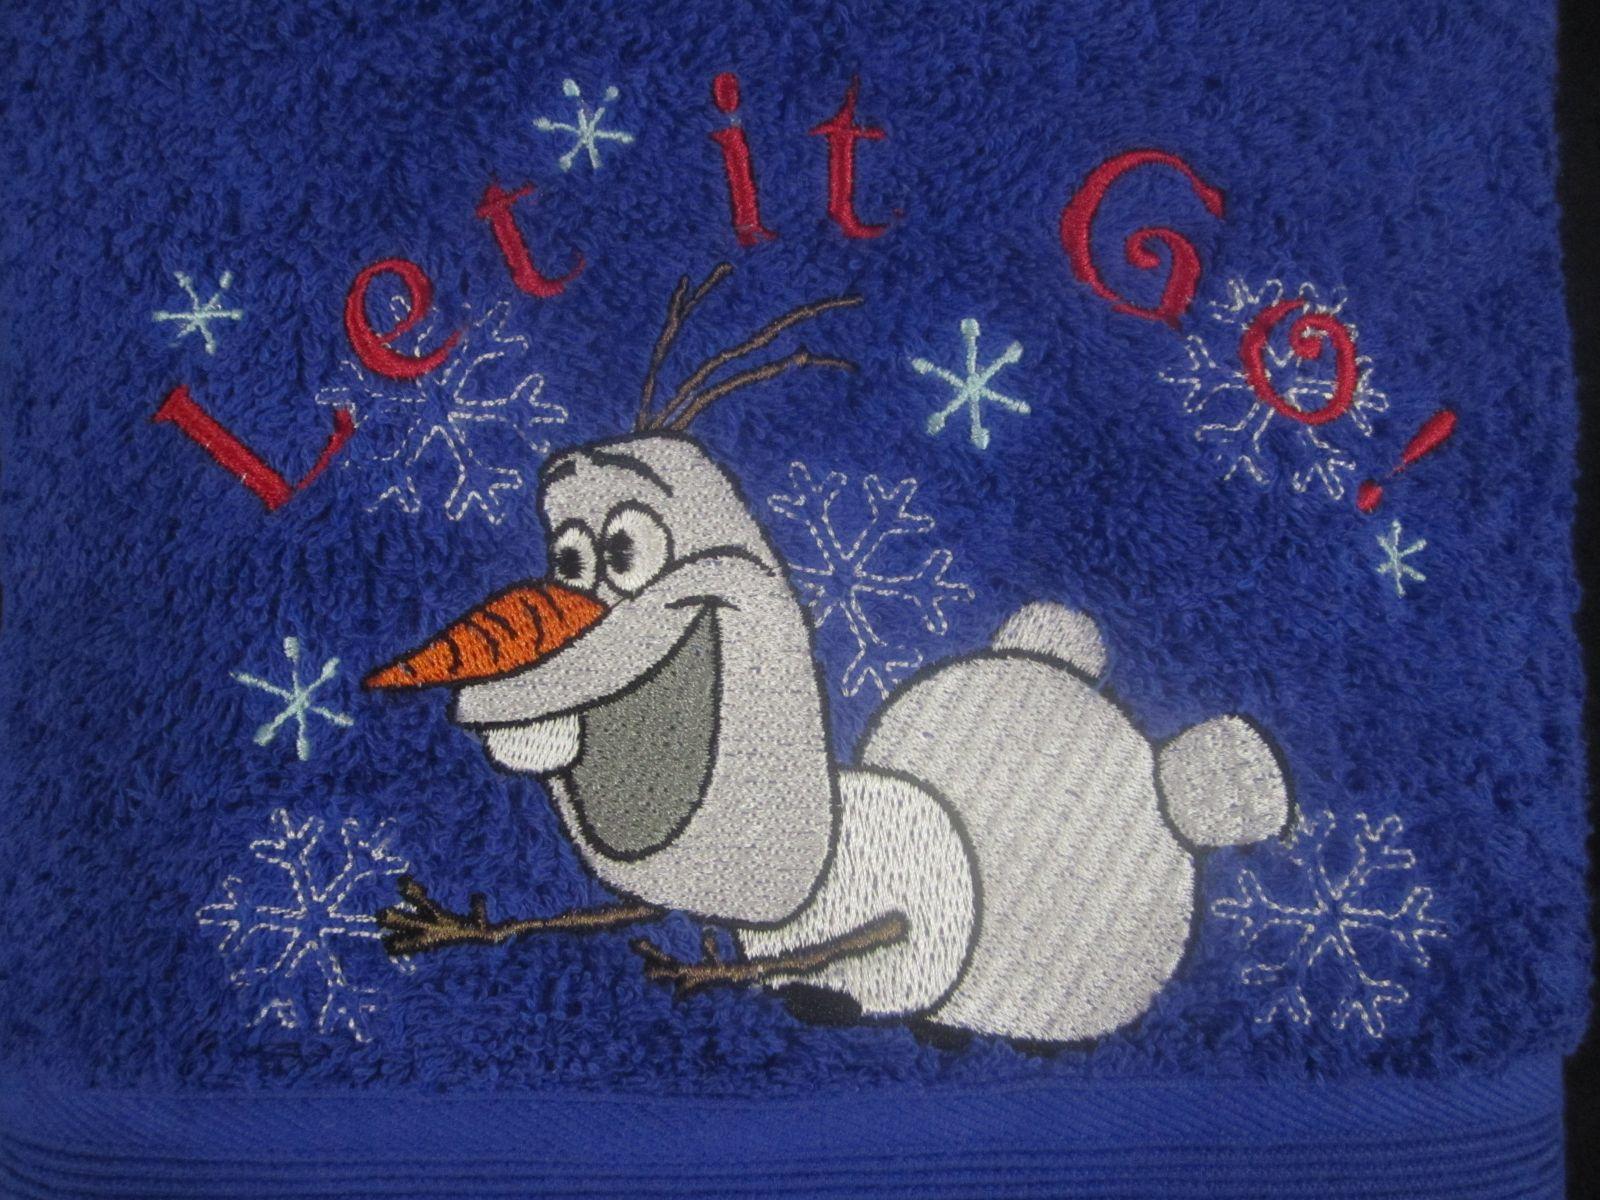 Olaf machine embroidery design